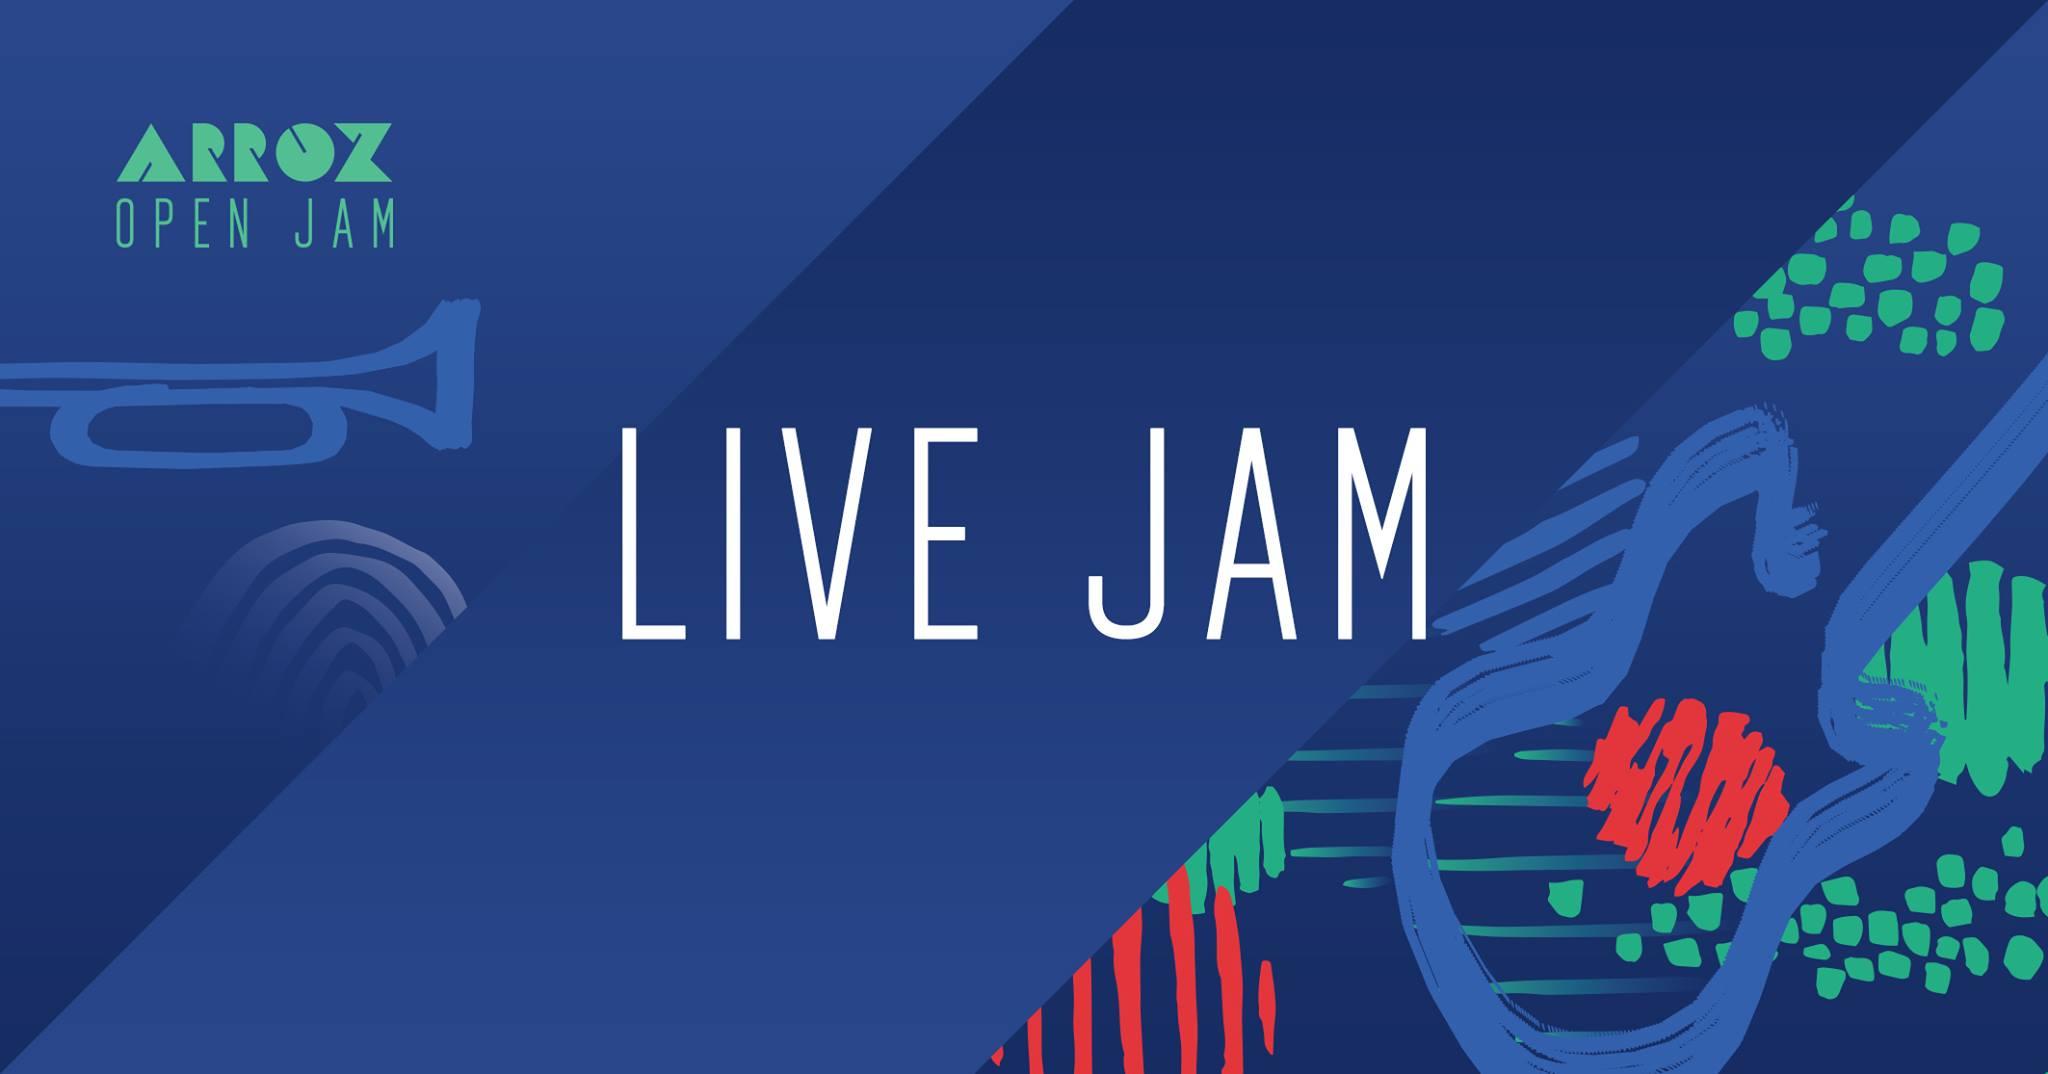 Arroz Live Jam